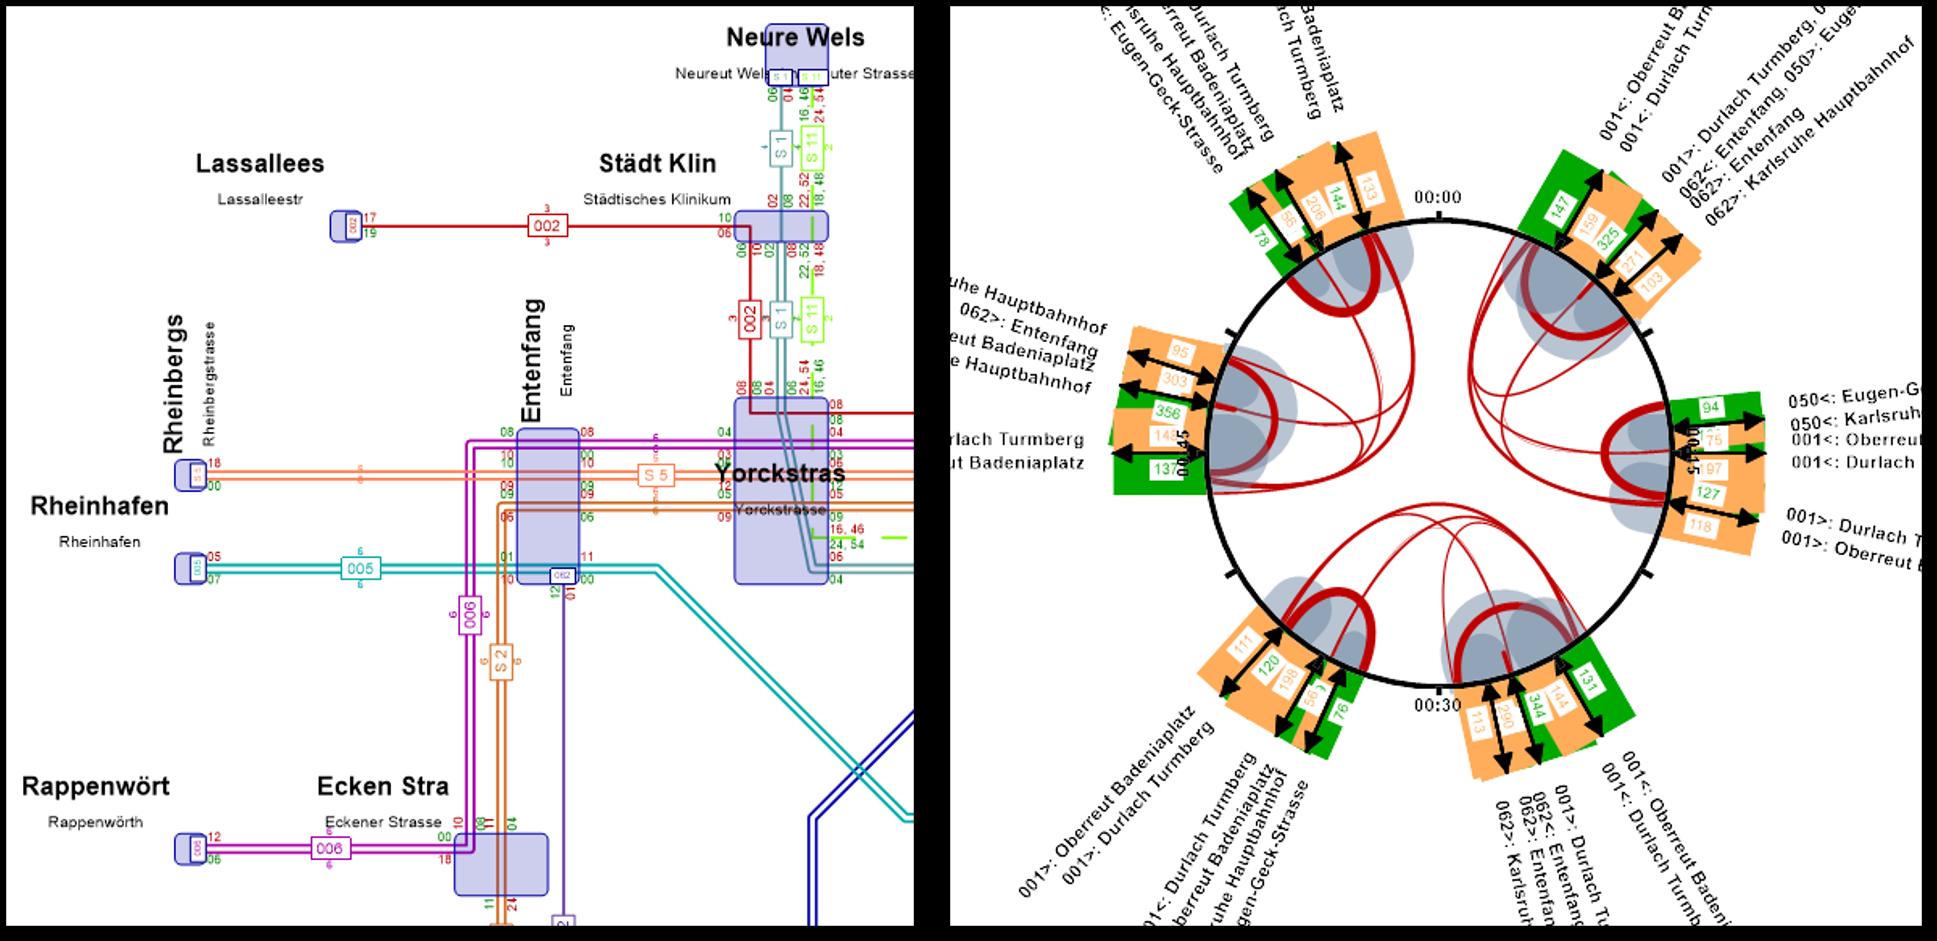 Visum Graphical Rail Timetable and Interchange Clock